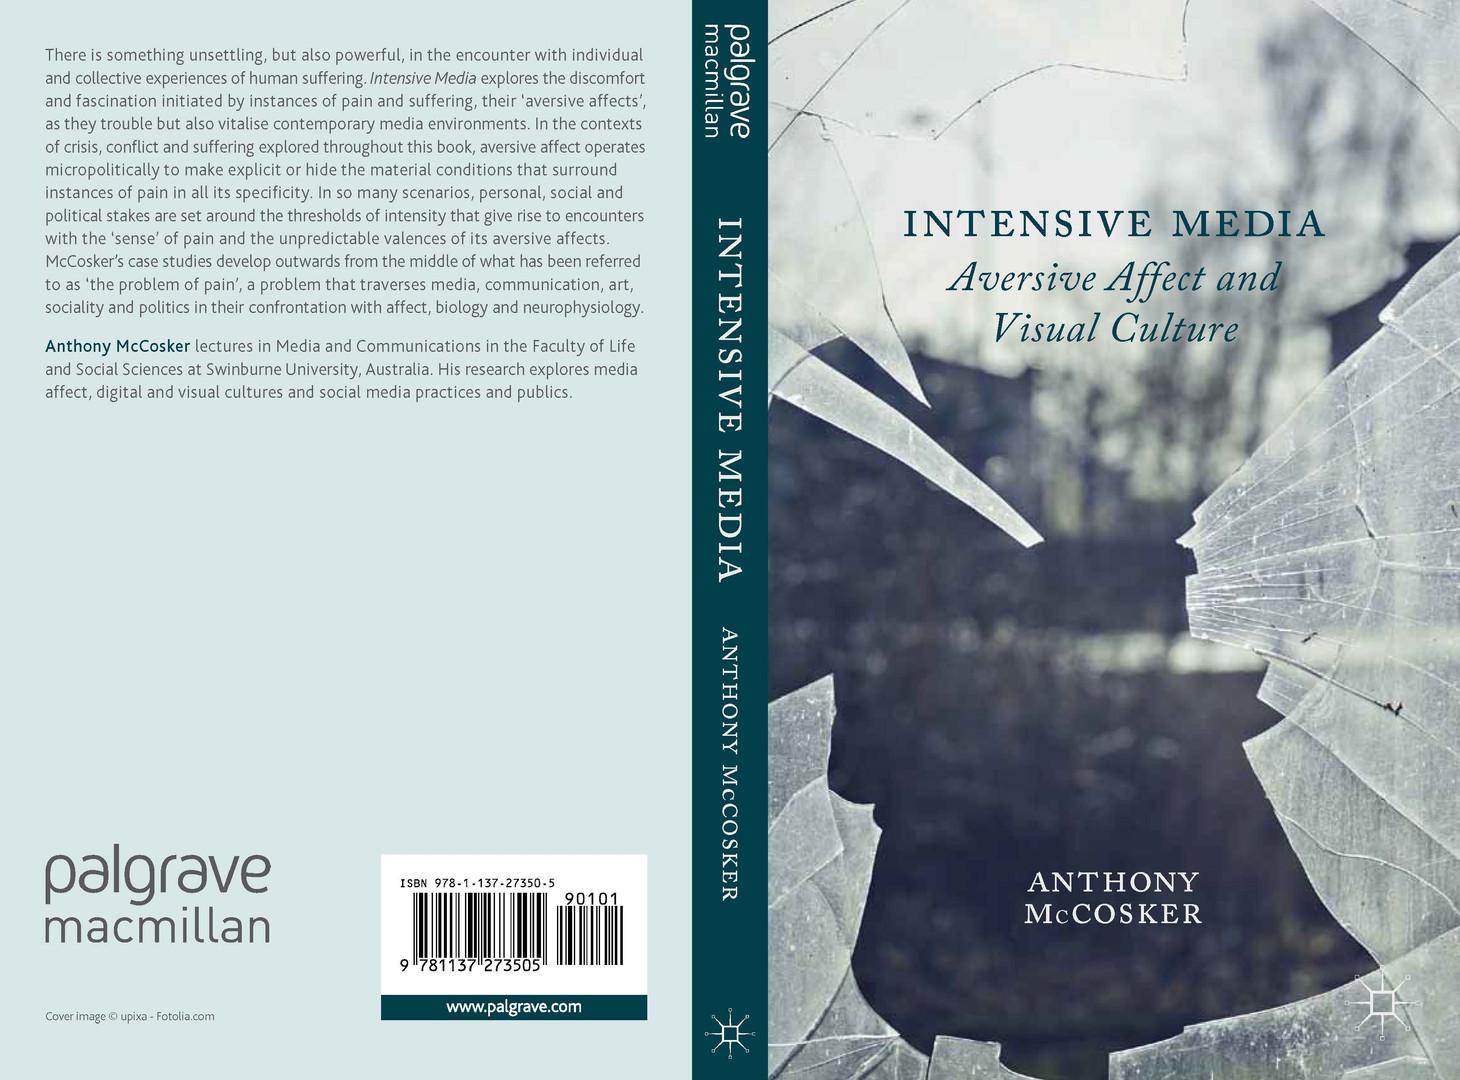 Intensive Media - Aversive Affect and Visual Culture